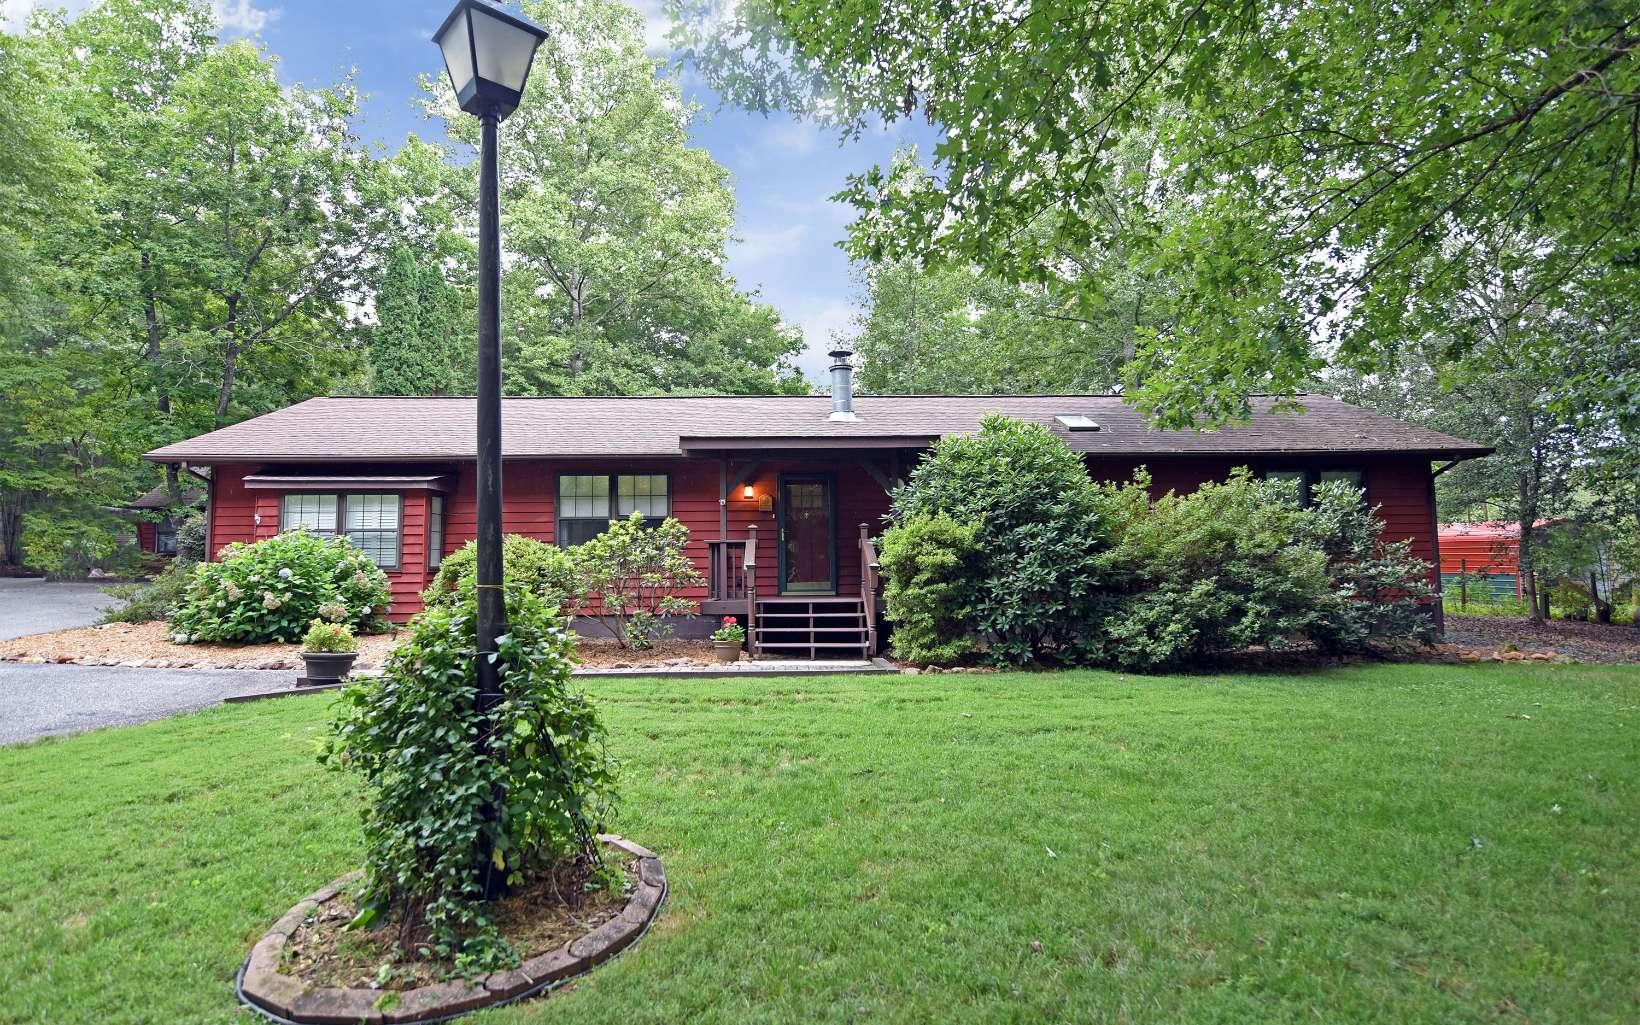 13 BILL HOCK RD,Blairsville,GA, US Blue Ridge, Georgia